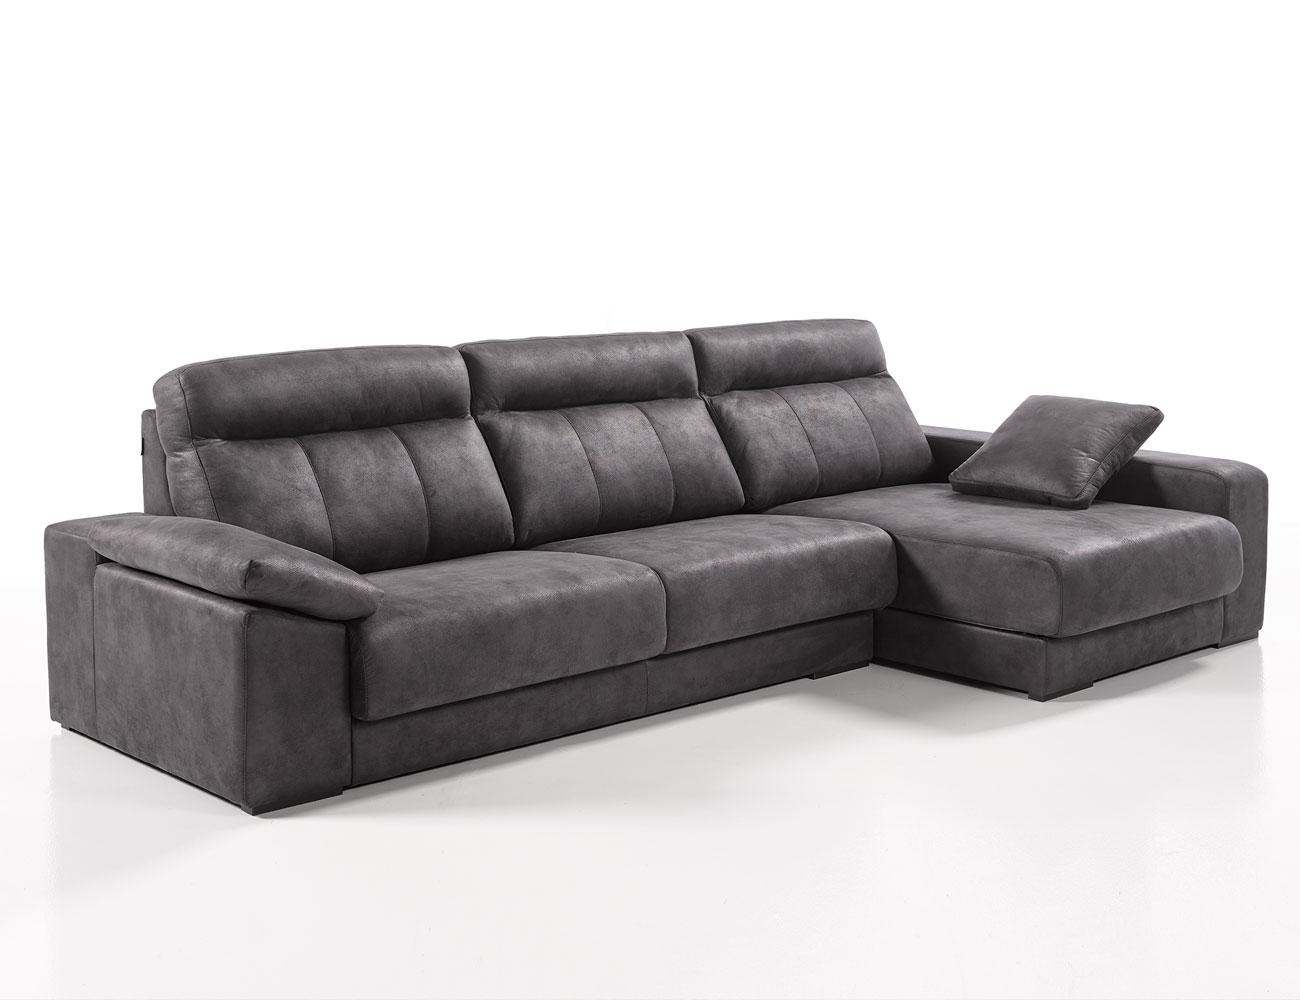 Sofa chaiselongue gama alta